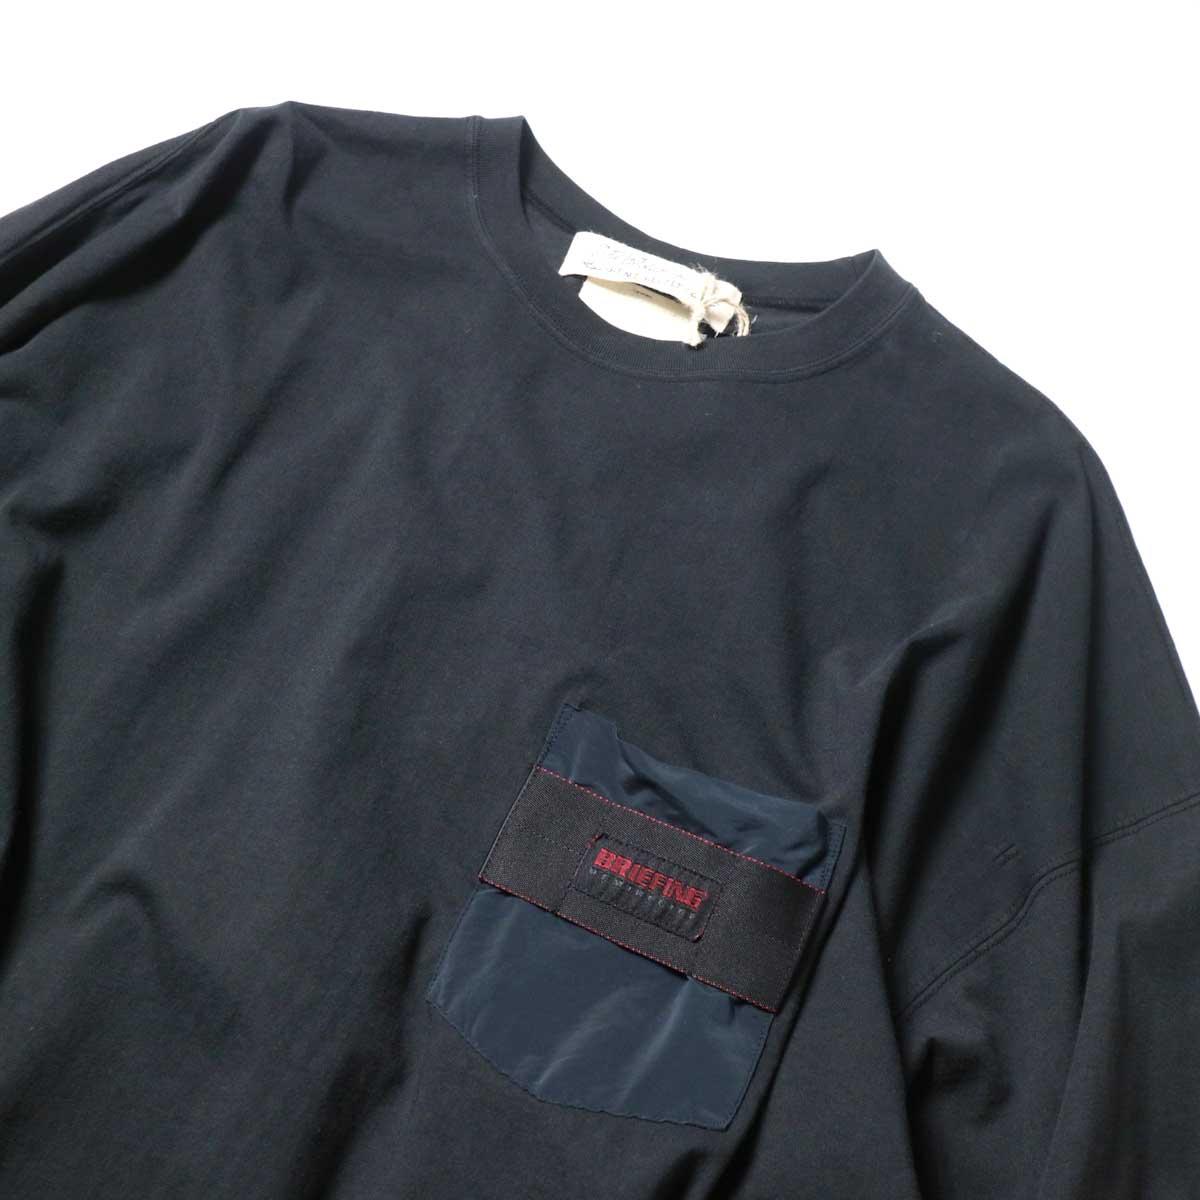 REMI RELIEF / ブリーフィング 30/天竺ベンチレーションロンT (Black)クルーネック